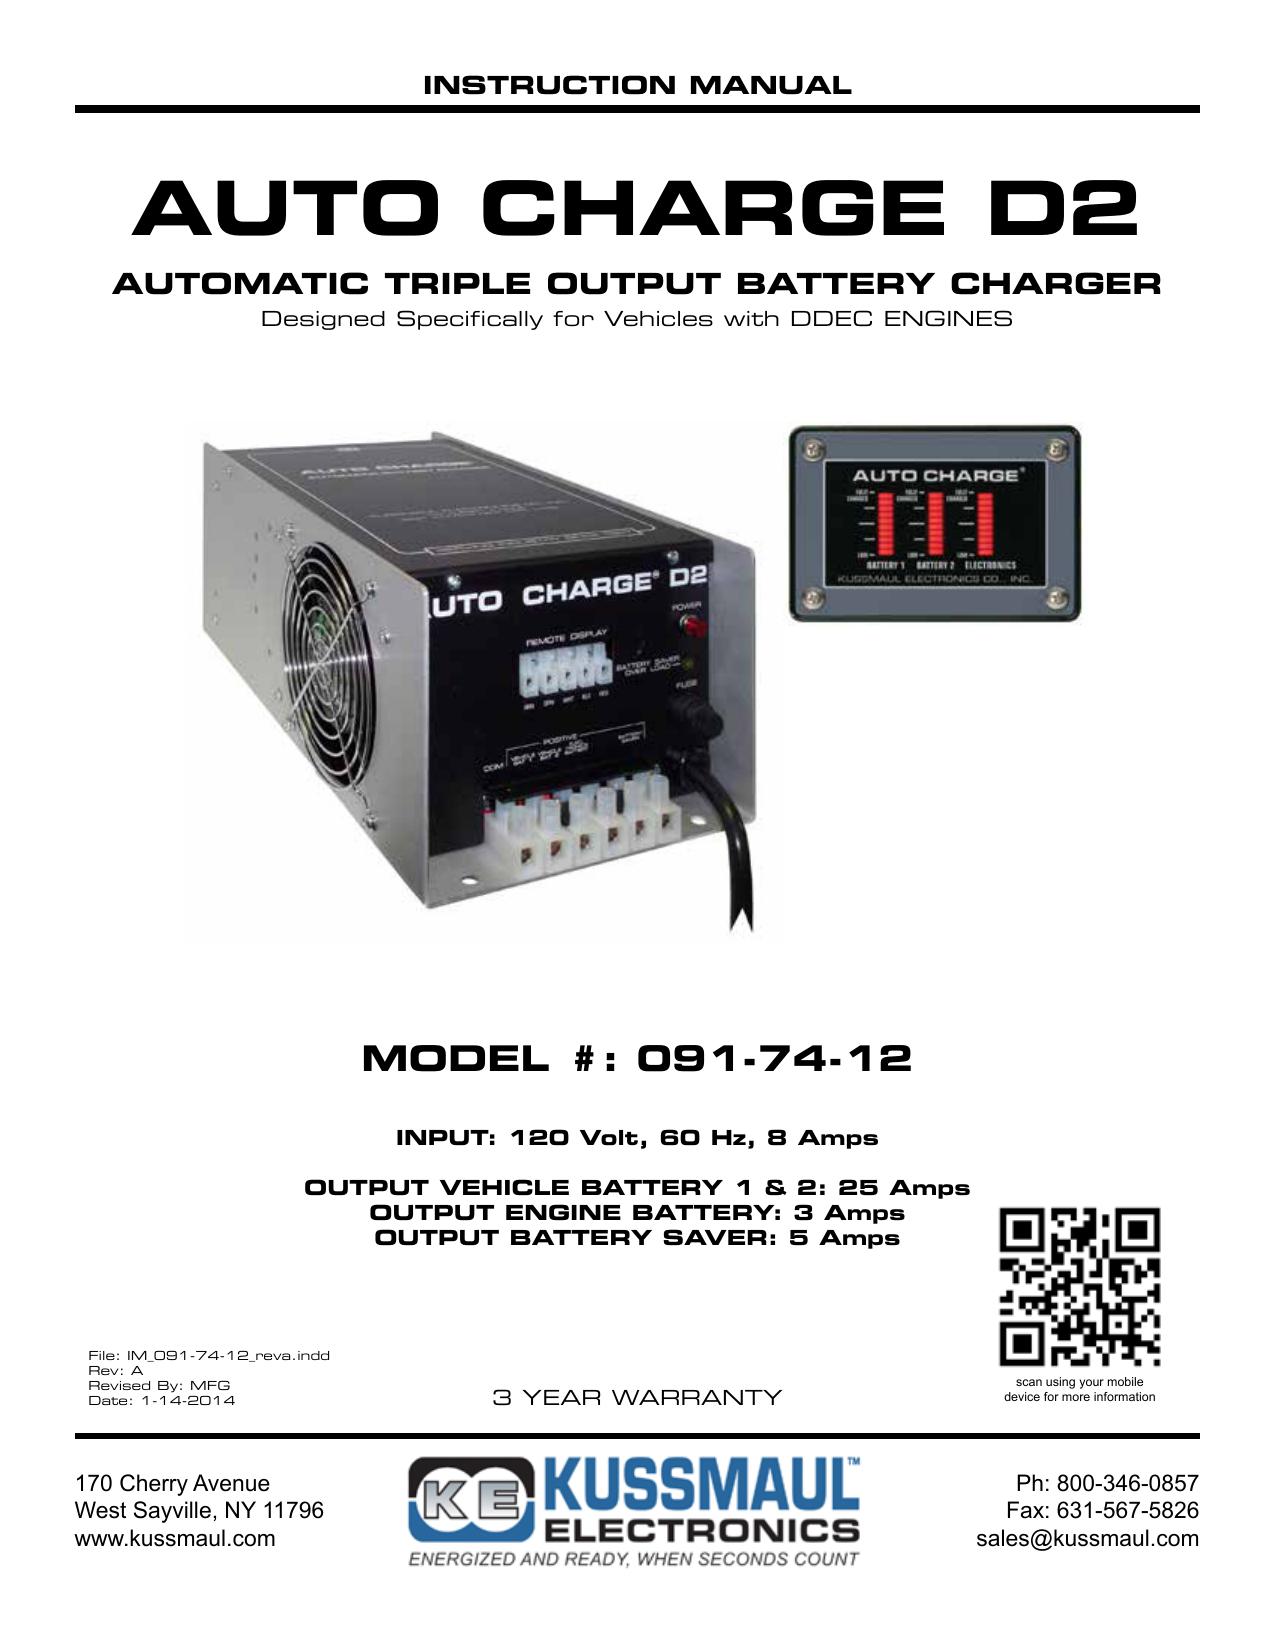 auto charge d2 - kussmaul electronics